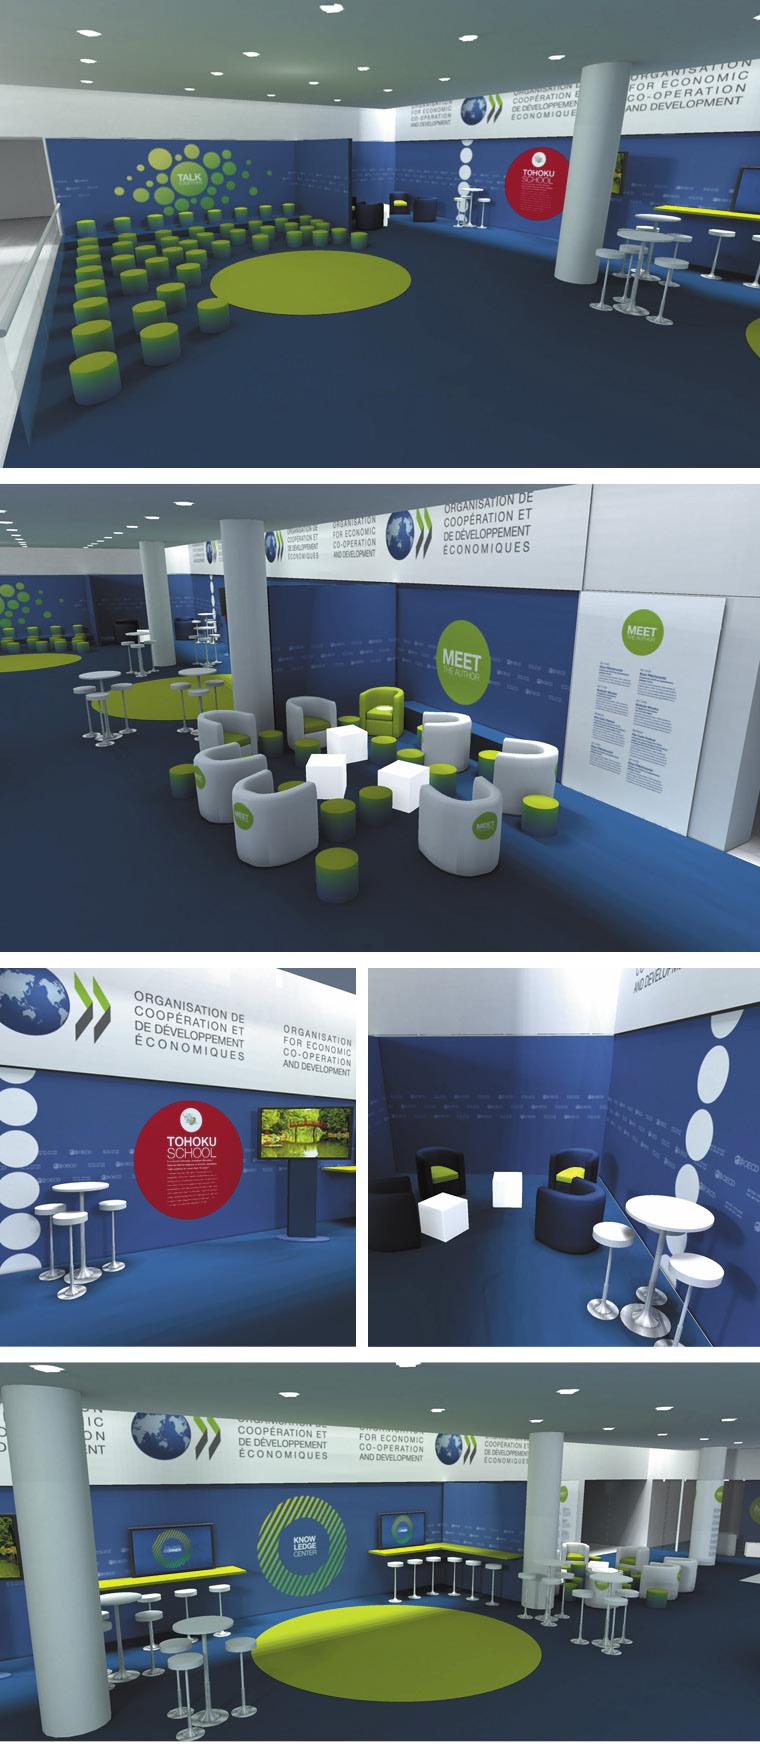 OCDE week 2014 3D